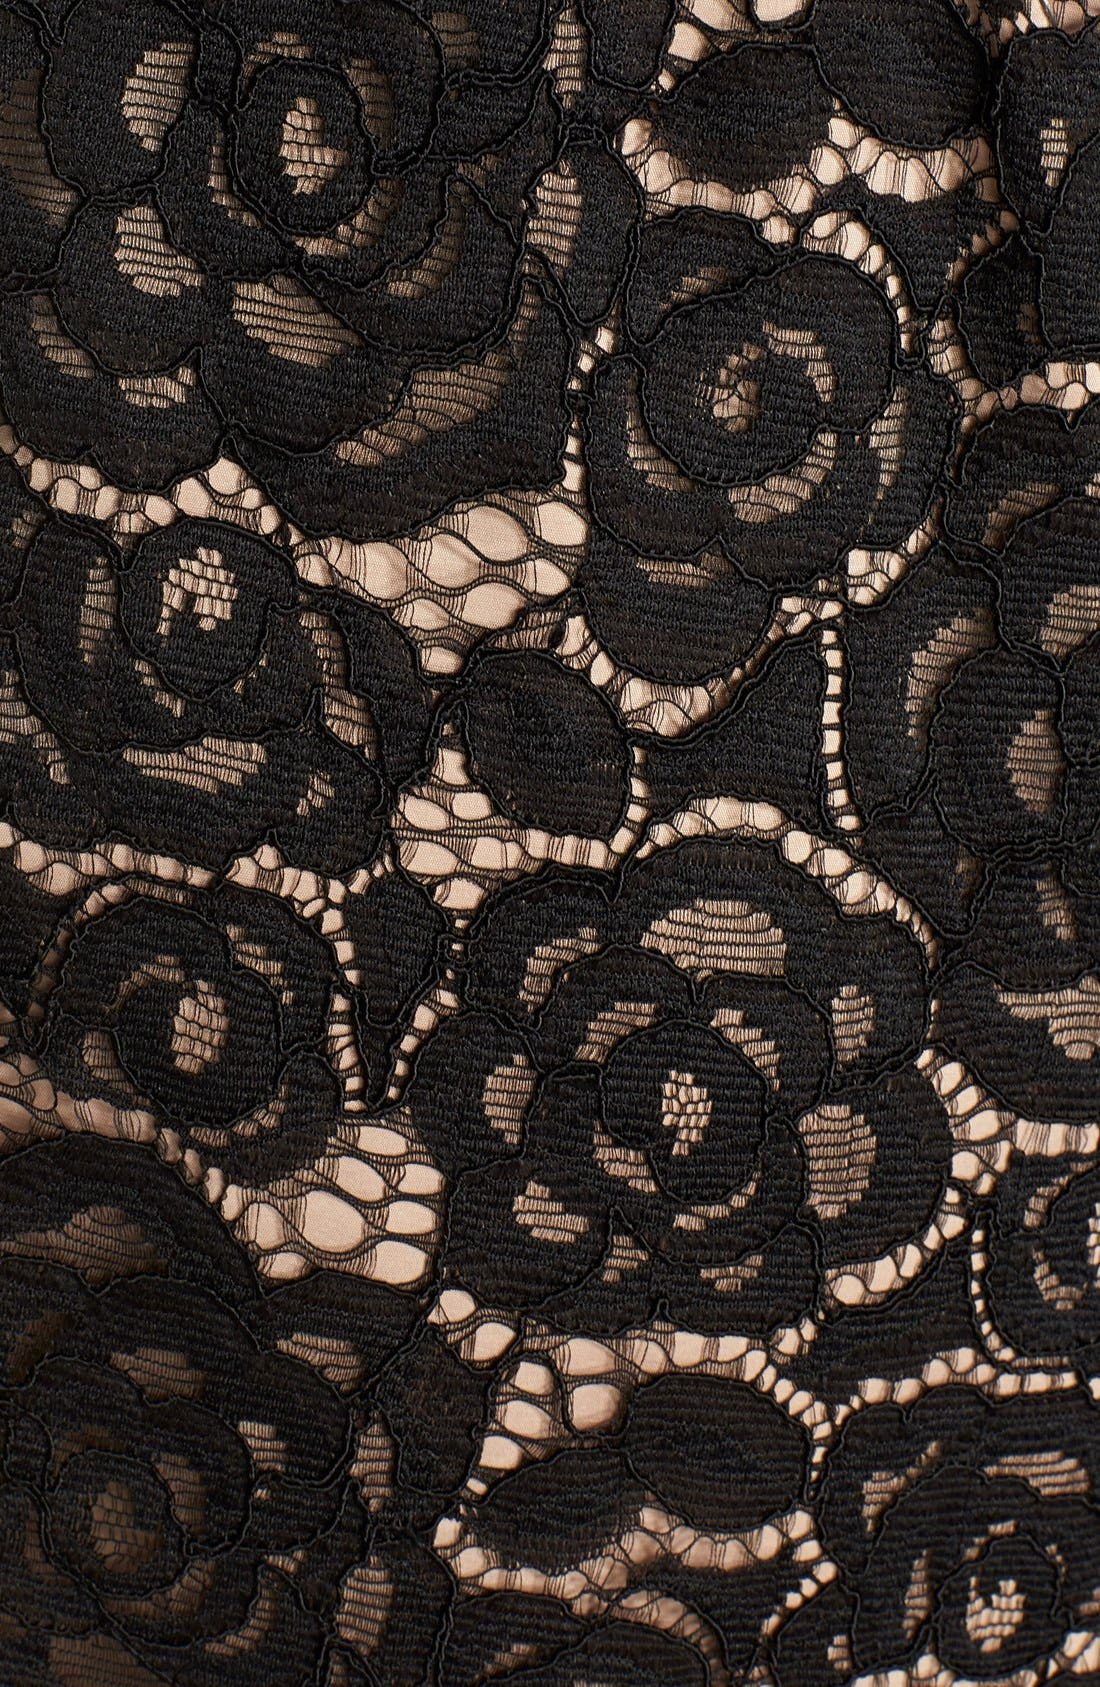 Off the Shoulder Lace Sheath Dress,                             Alternate thumbnail 2, color,                             BLACK/ NUDE